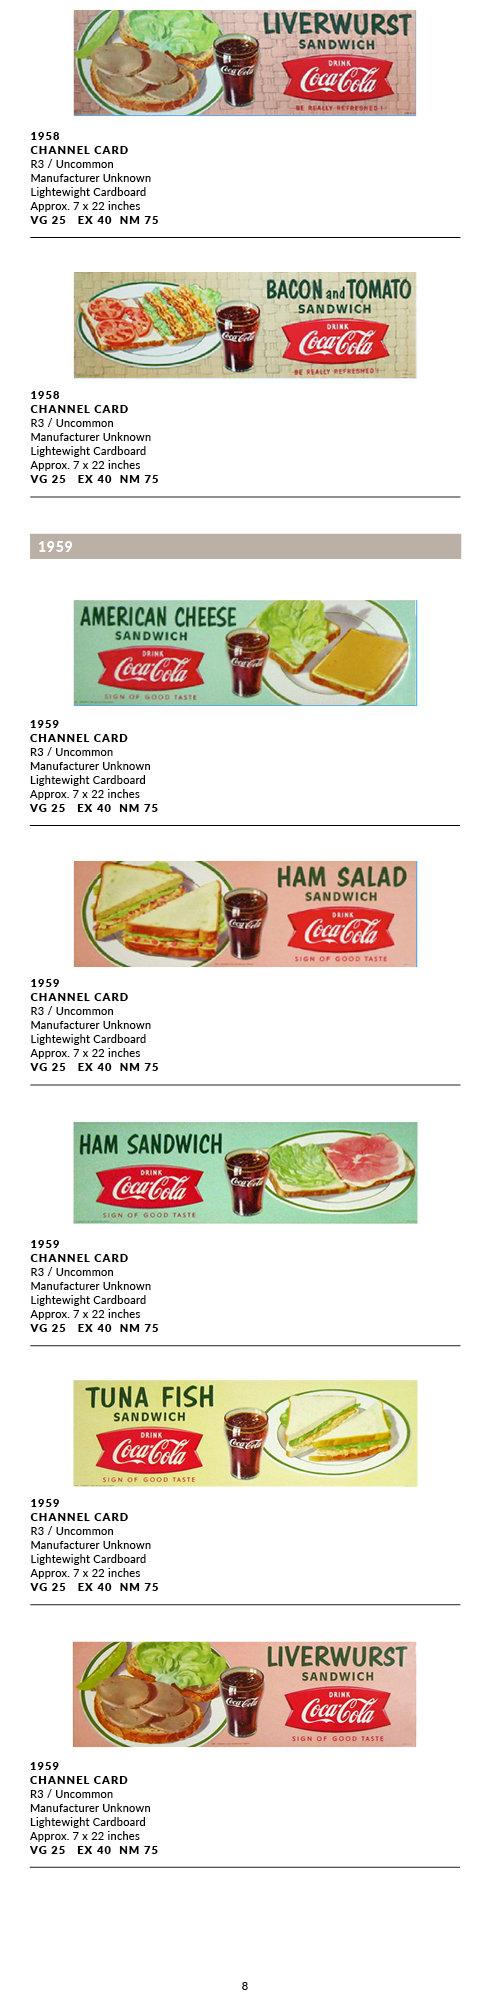 Food Channel Card8.jpg